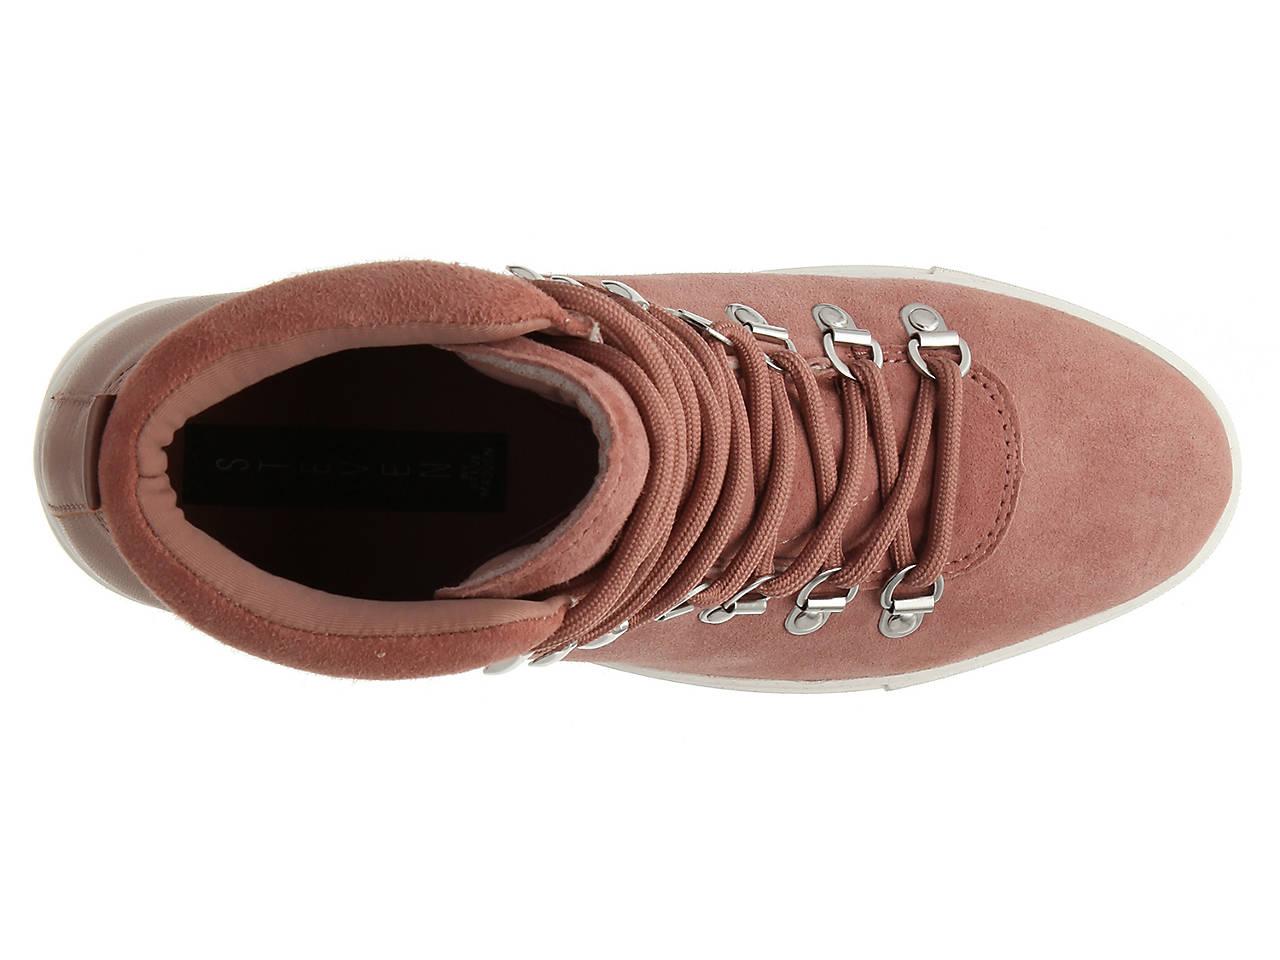 ee5a10c9e2b Steven by Steve Madden Kalea Wedge High-Top Sneaker Men s Shoes